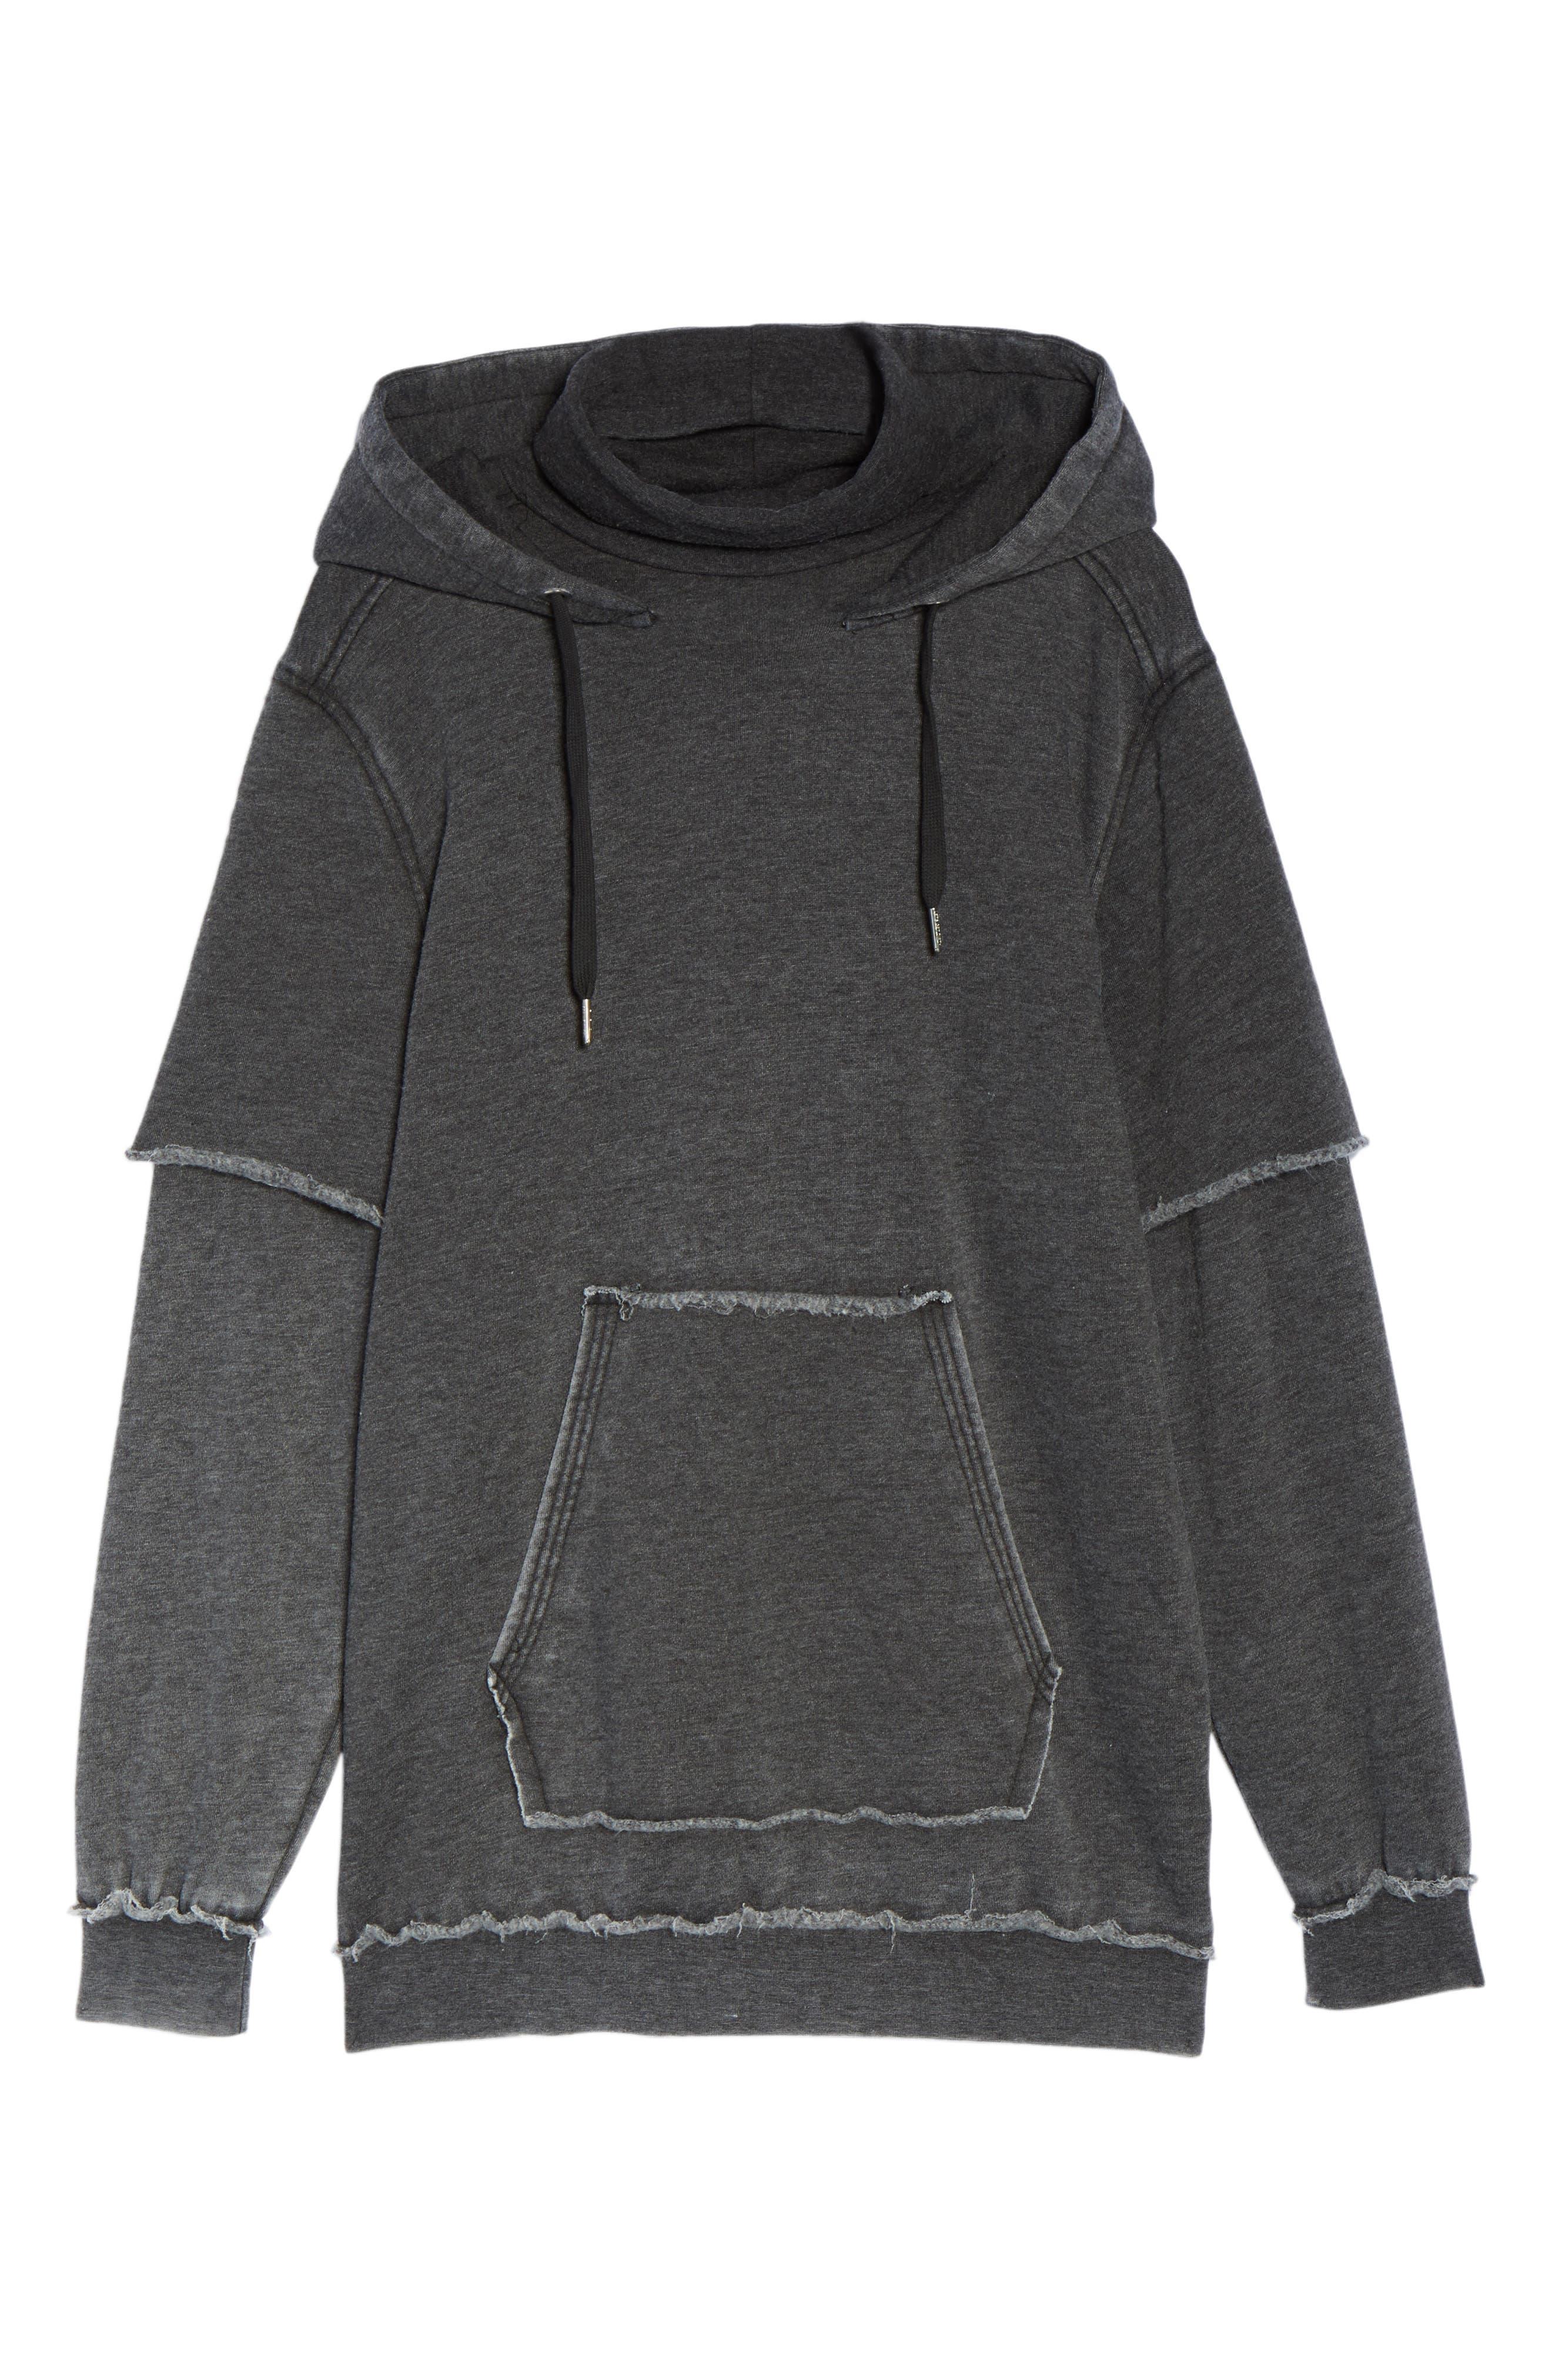 Good Hood Sweatshirt Dress,                             Alternate thumbnail 6, color,                             020